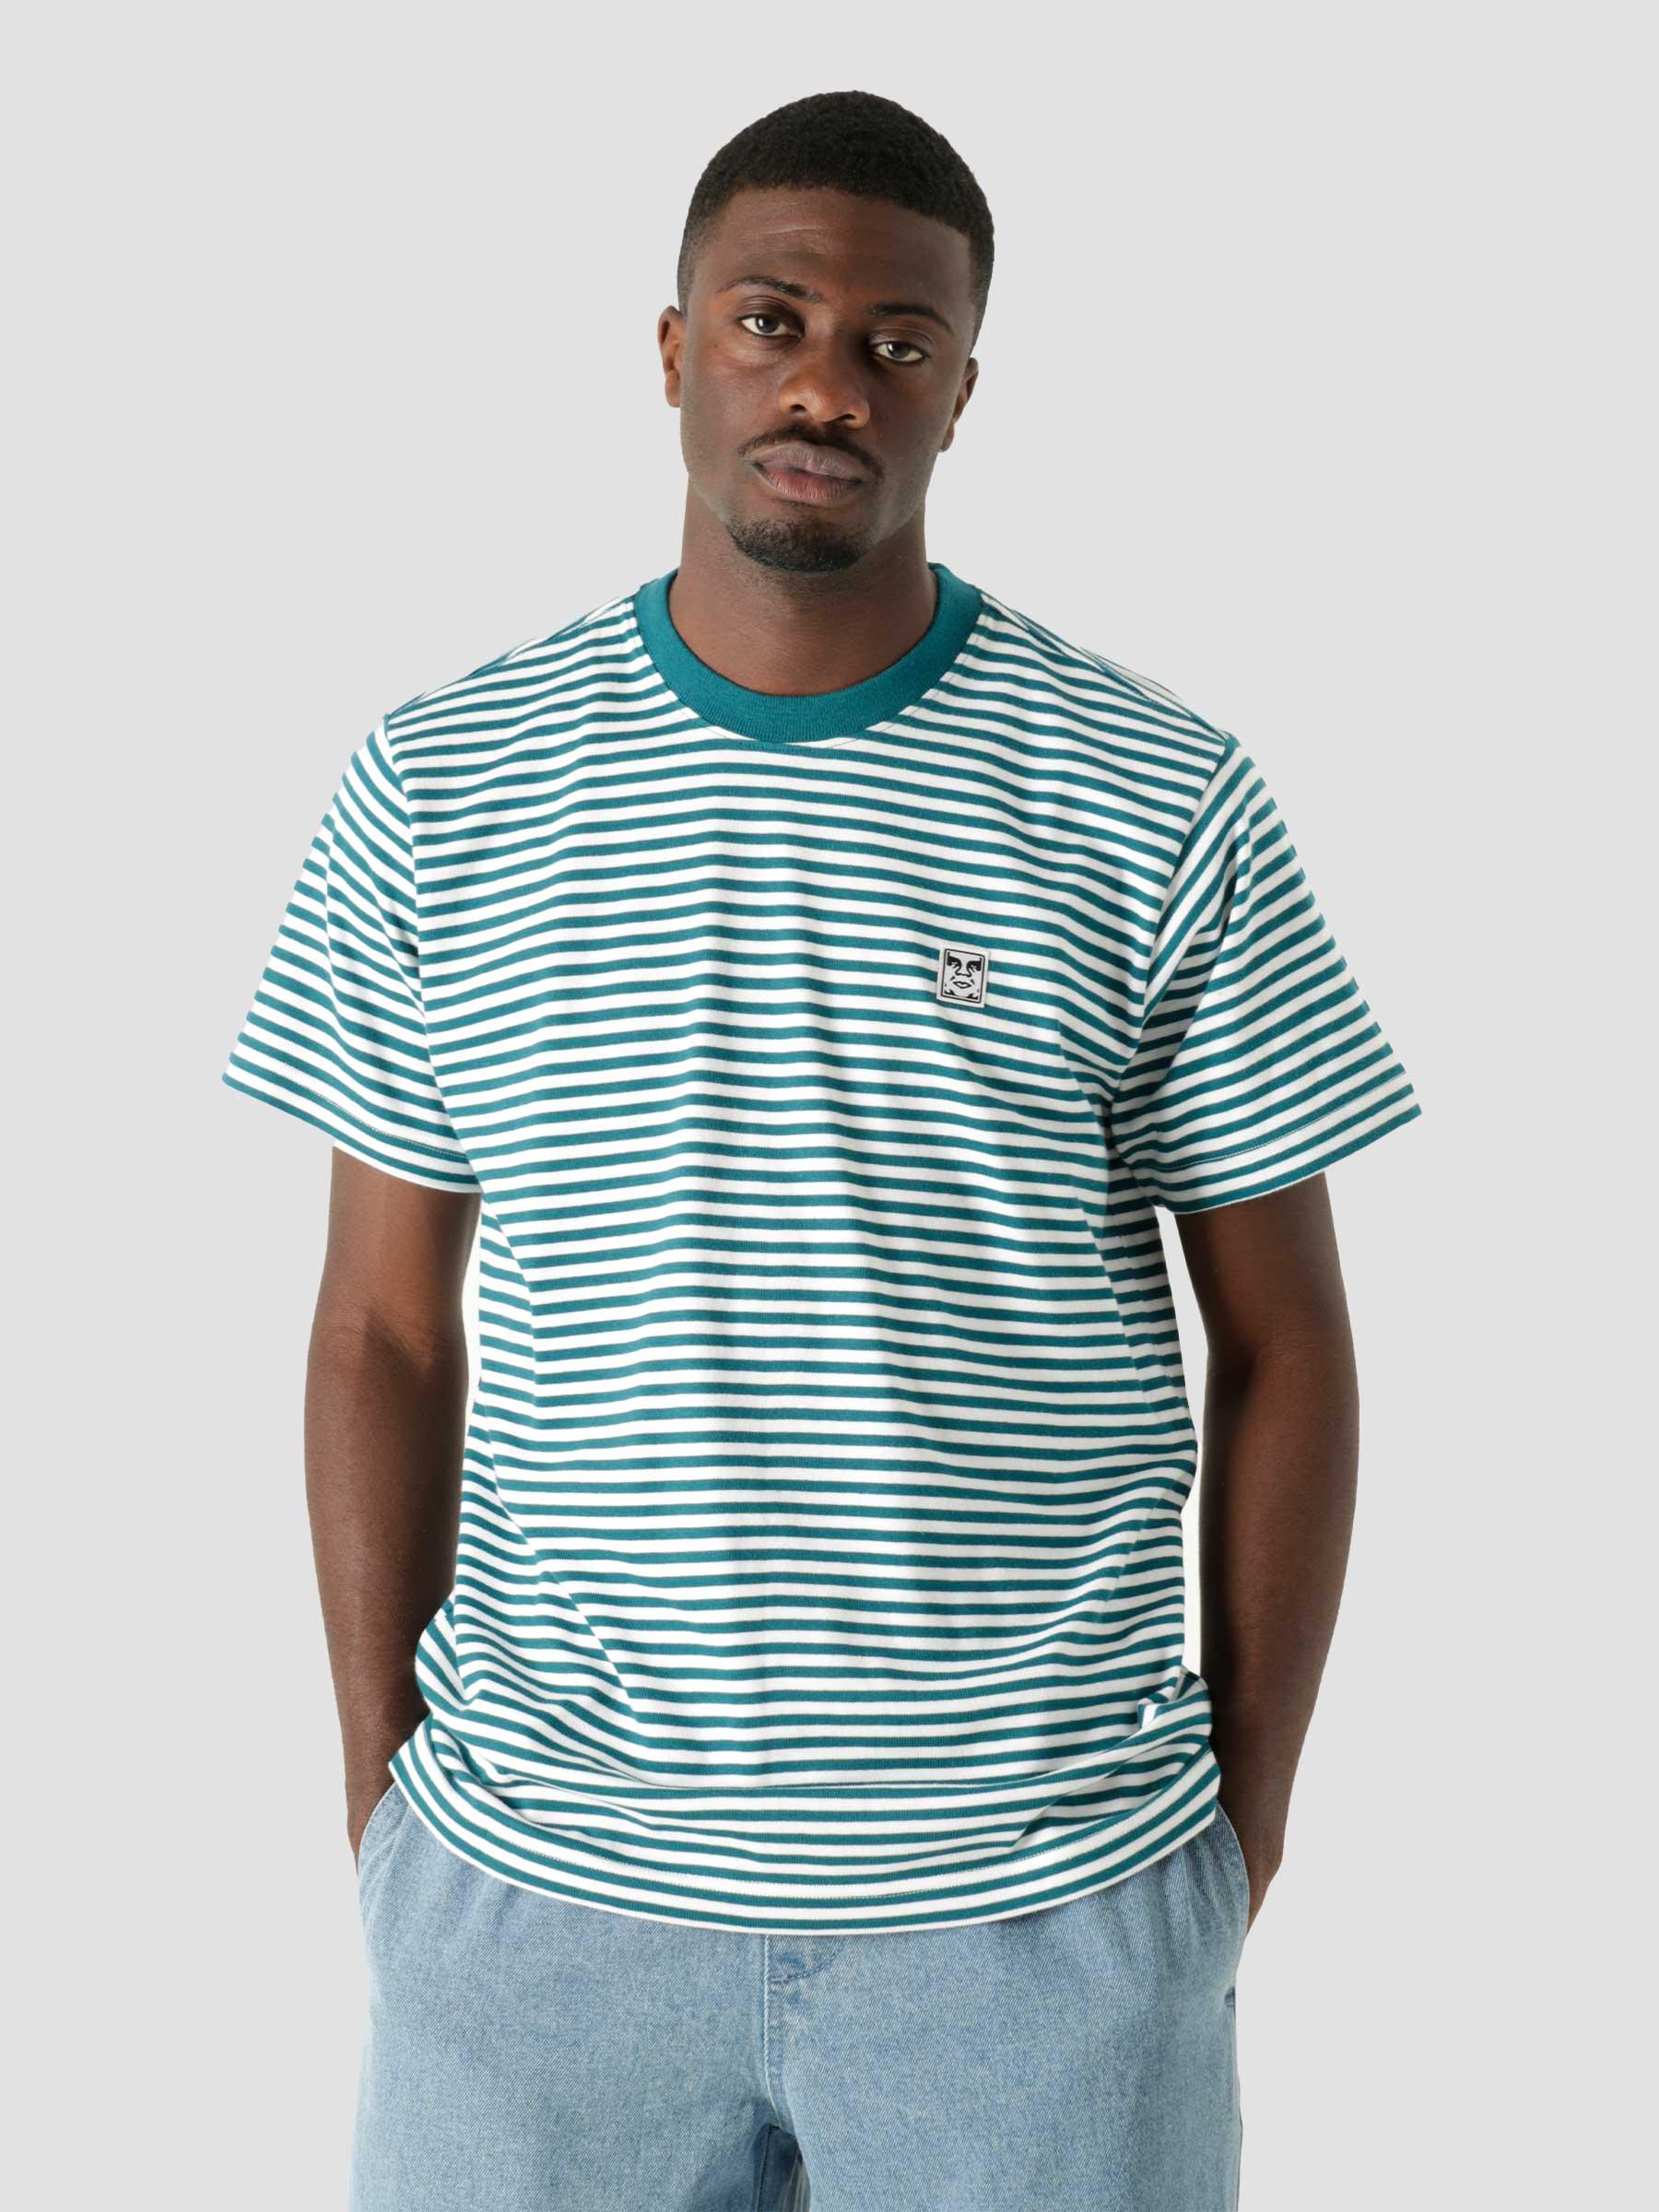 Icon Legacy T-Shirt S/S Knit Deep Ocean Multi 131080310